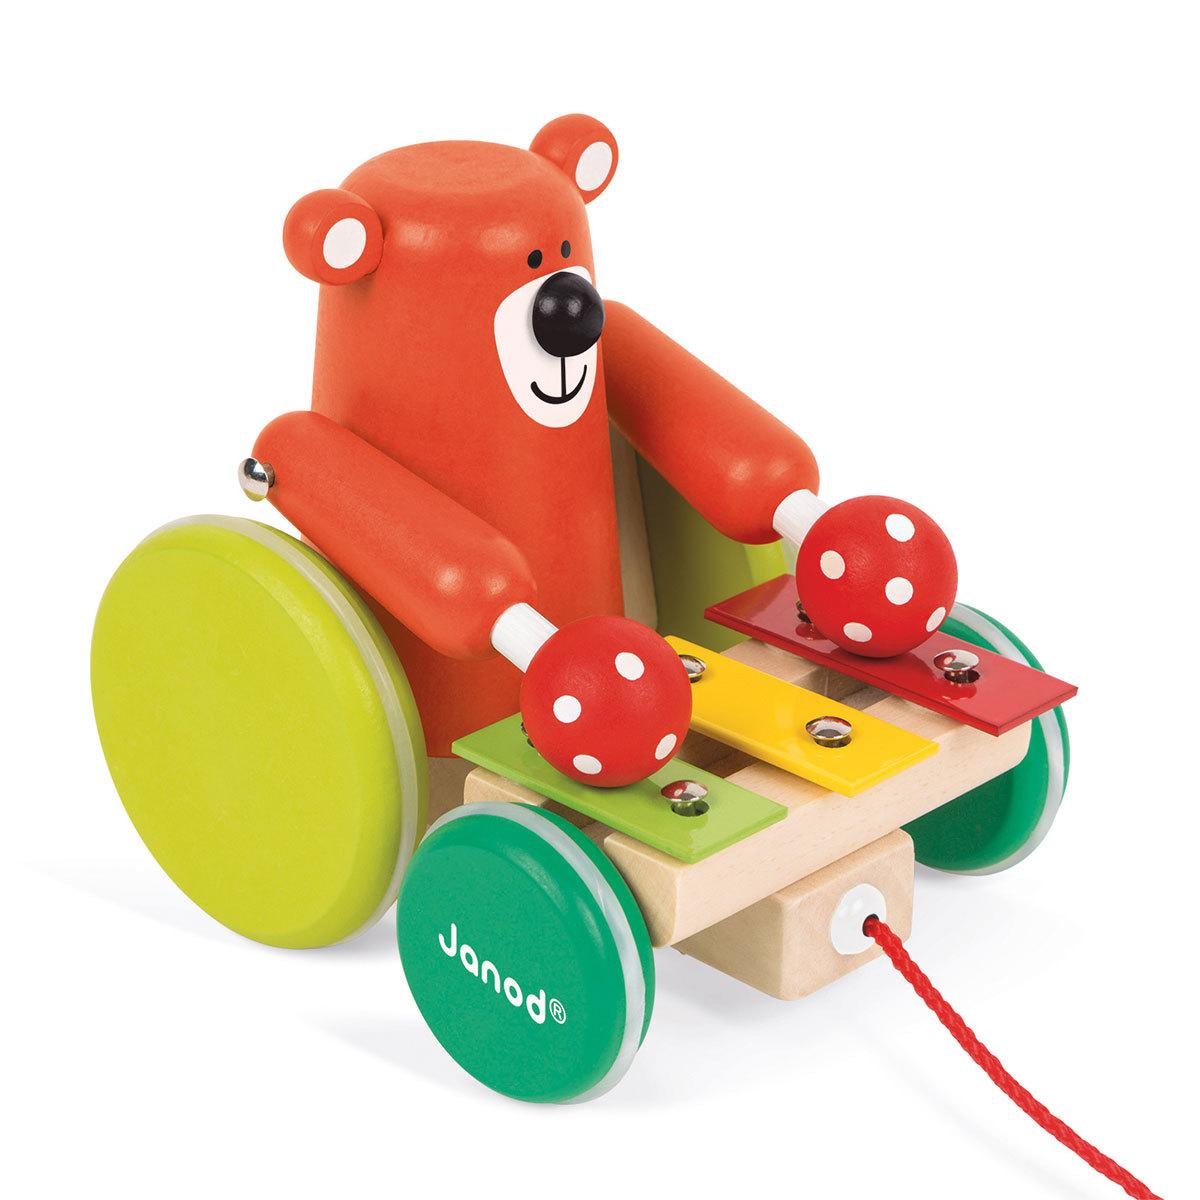 Mes premiers jouets Ours Xylo à Promener Zigolos Ours Xylo à Promener Zigolos